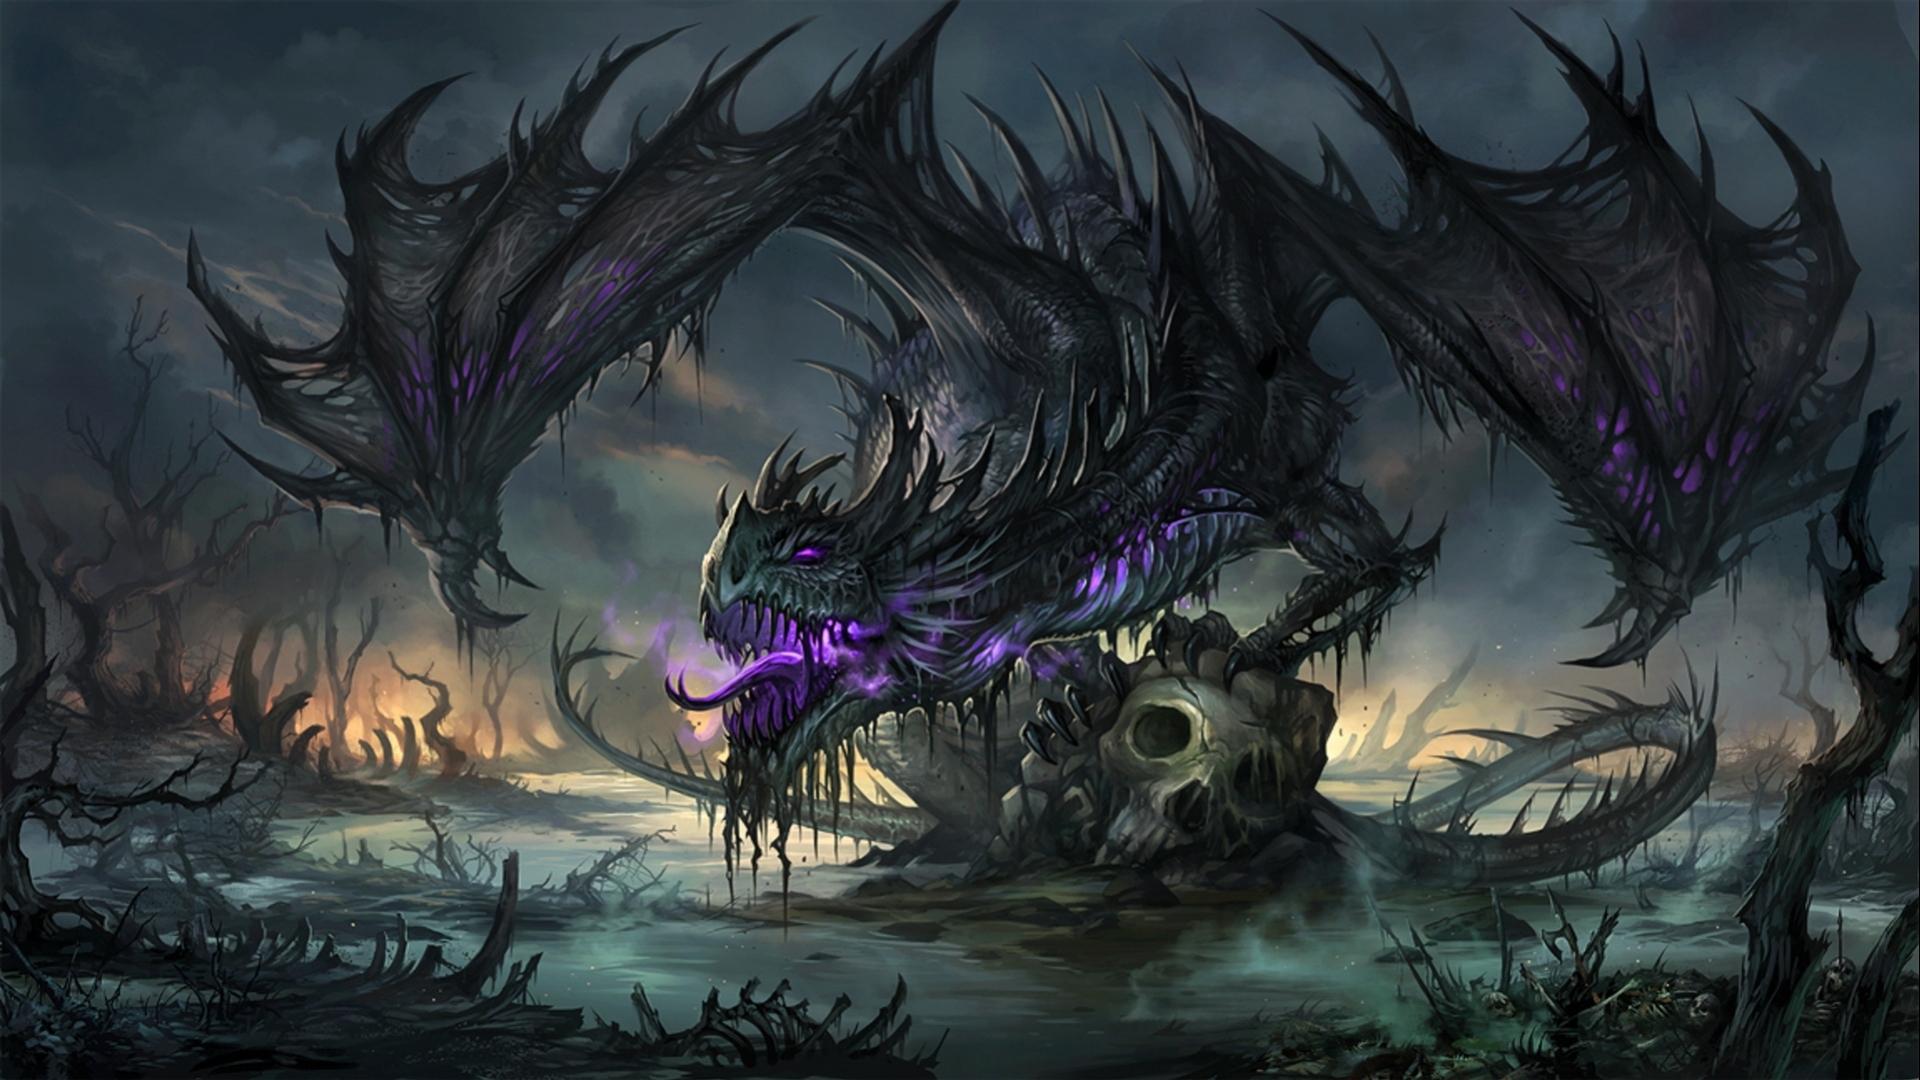 дракон, крылья, глаза